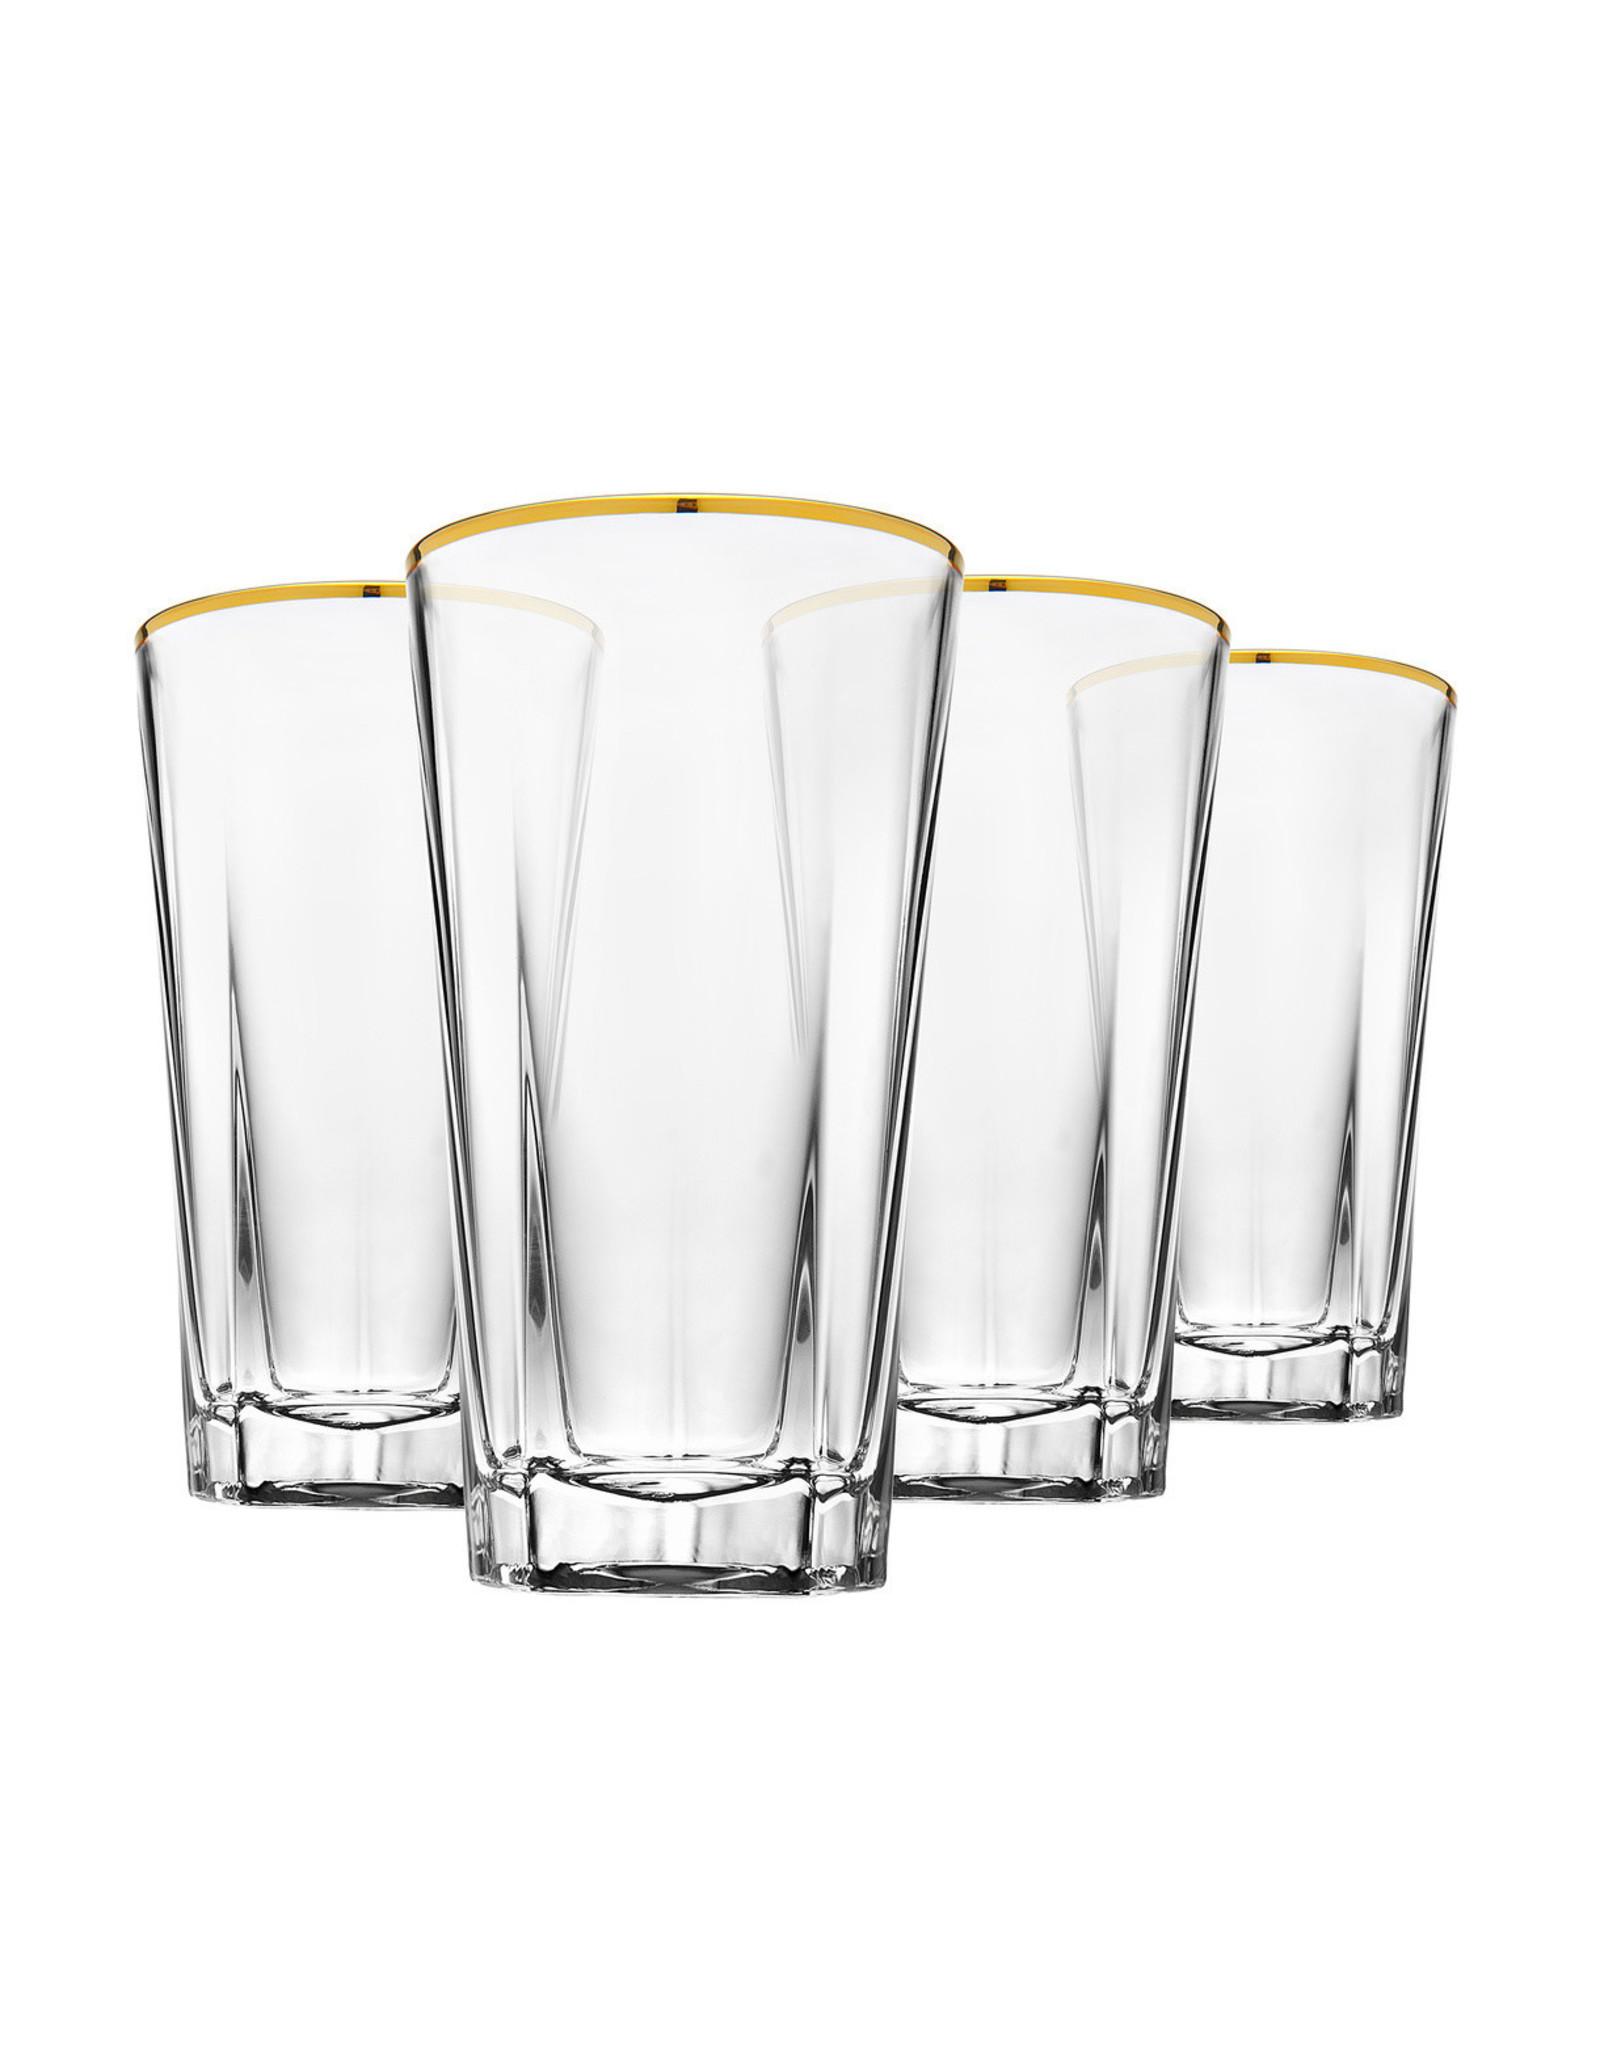 48372 S/4 Hudson Gold Banded HB Glass